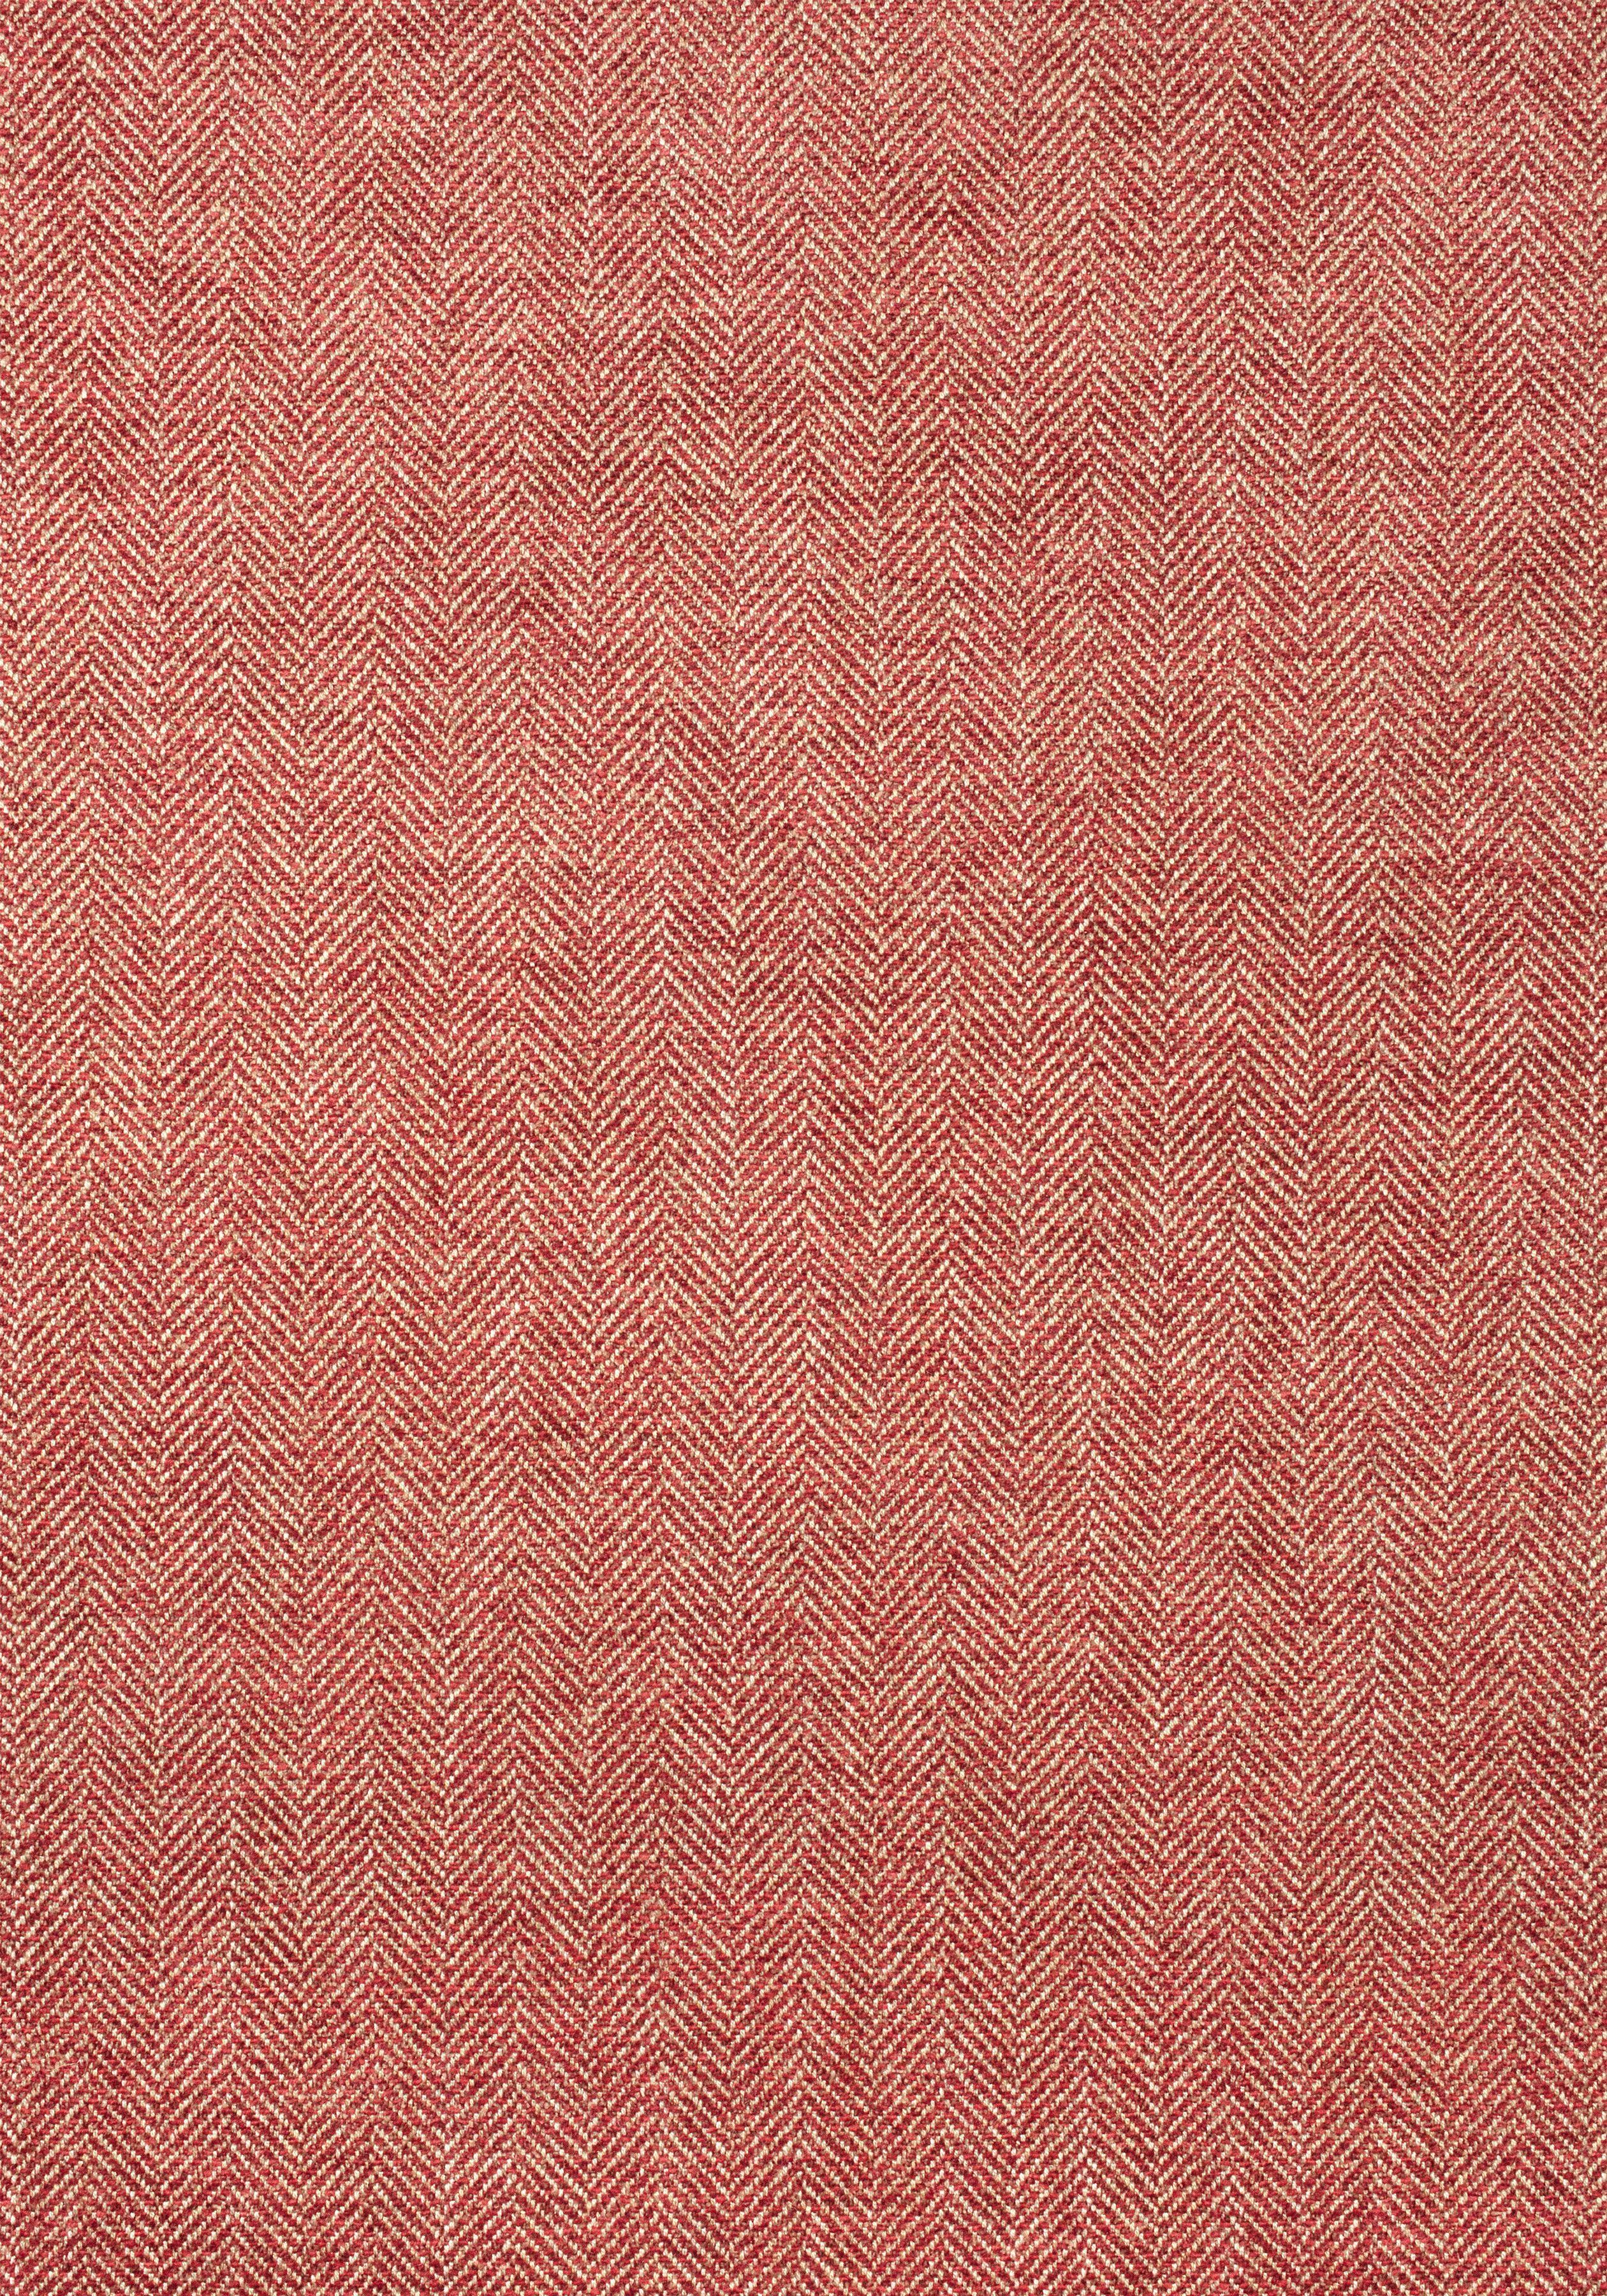 W80714 HADRIAN HERRINGBONE Woven Fabrics Cardinal from the Thibaut Woven 11: Rialto collection